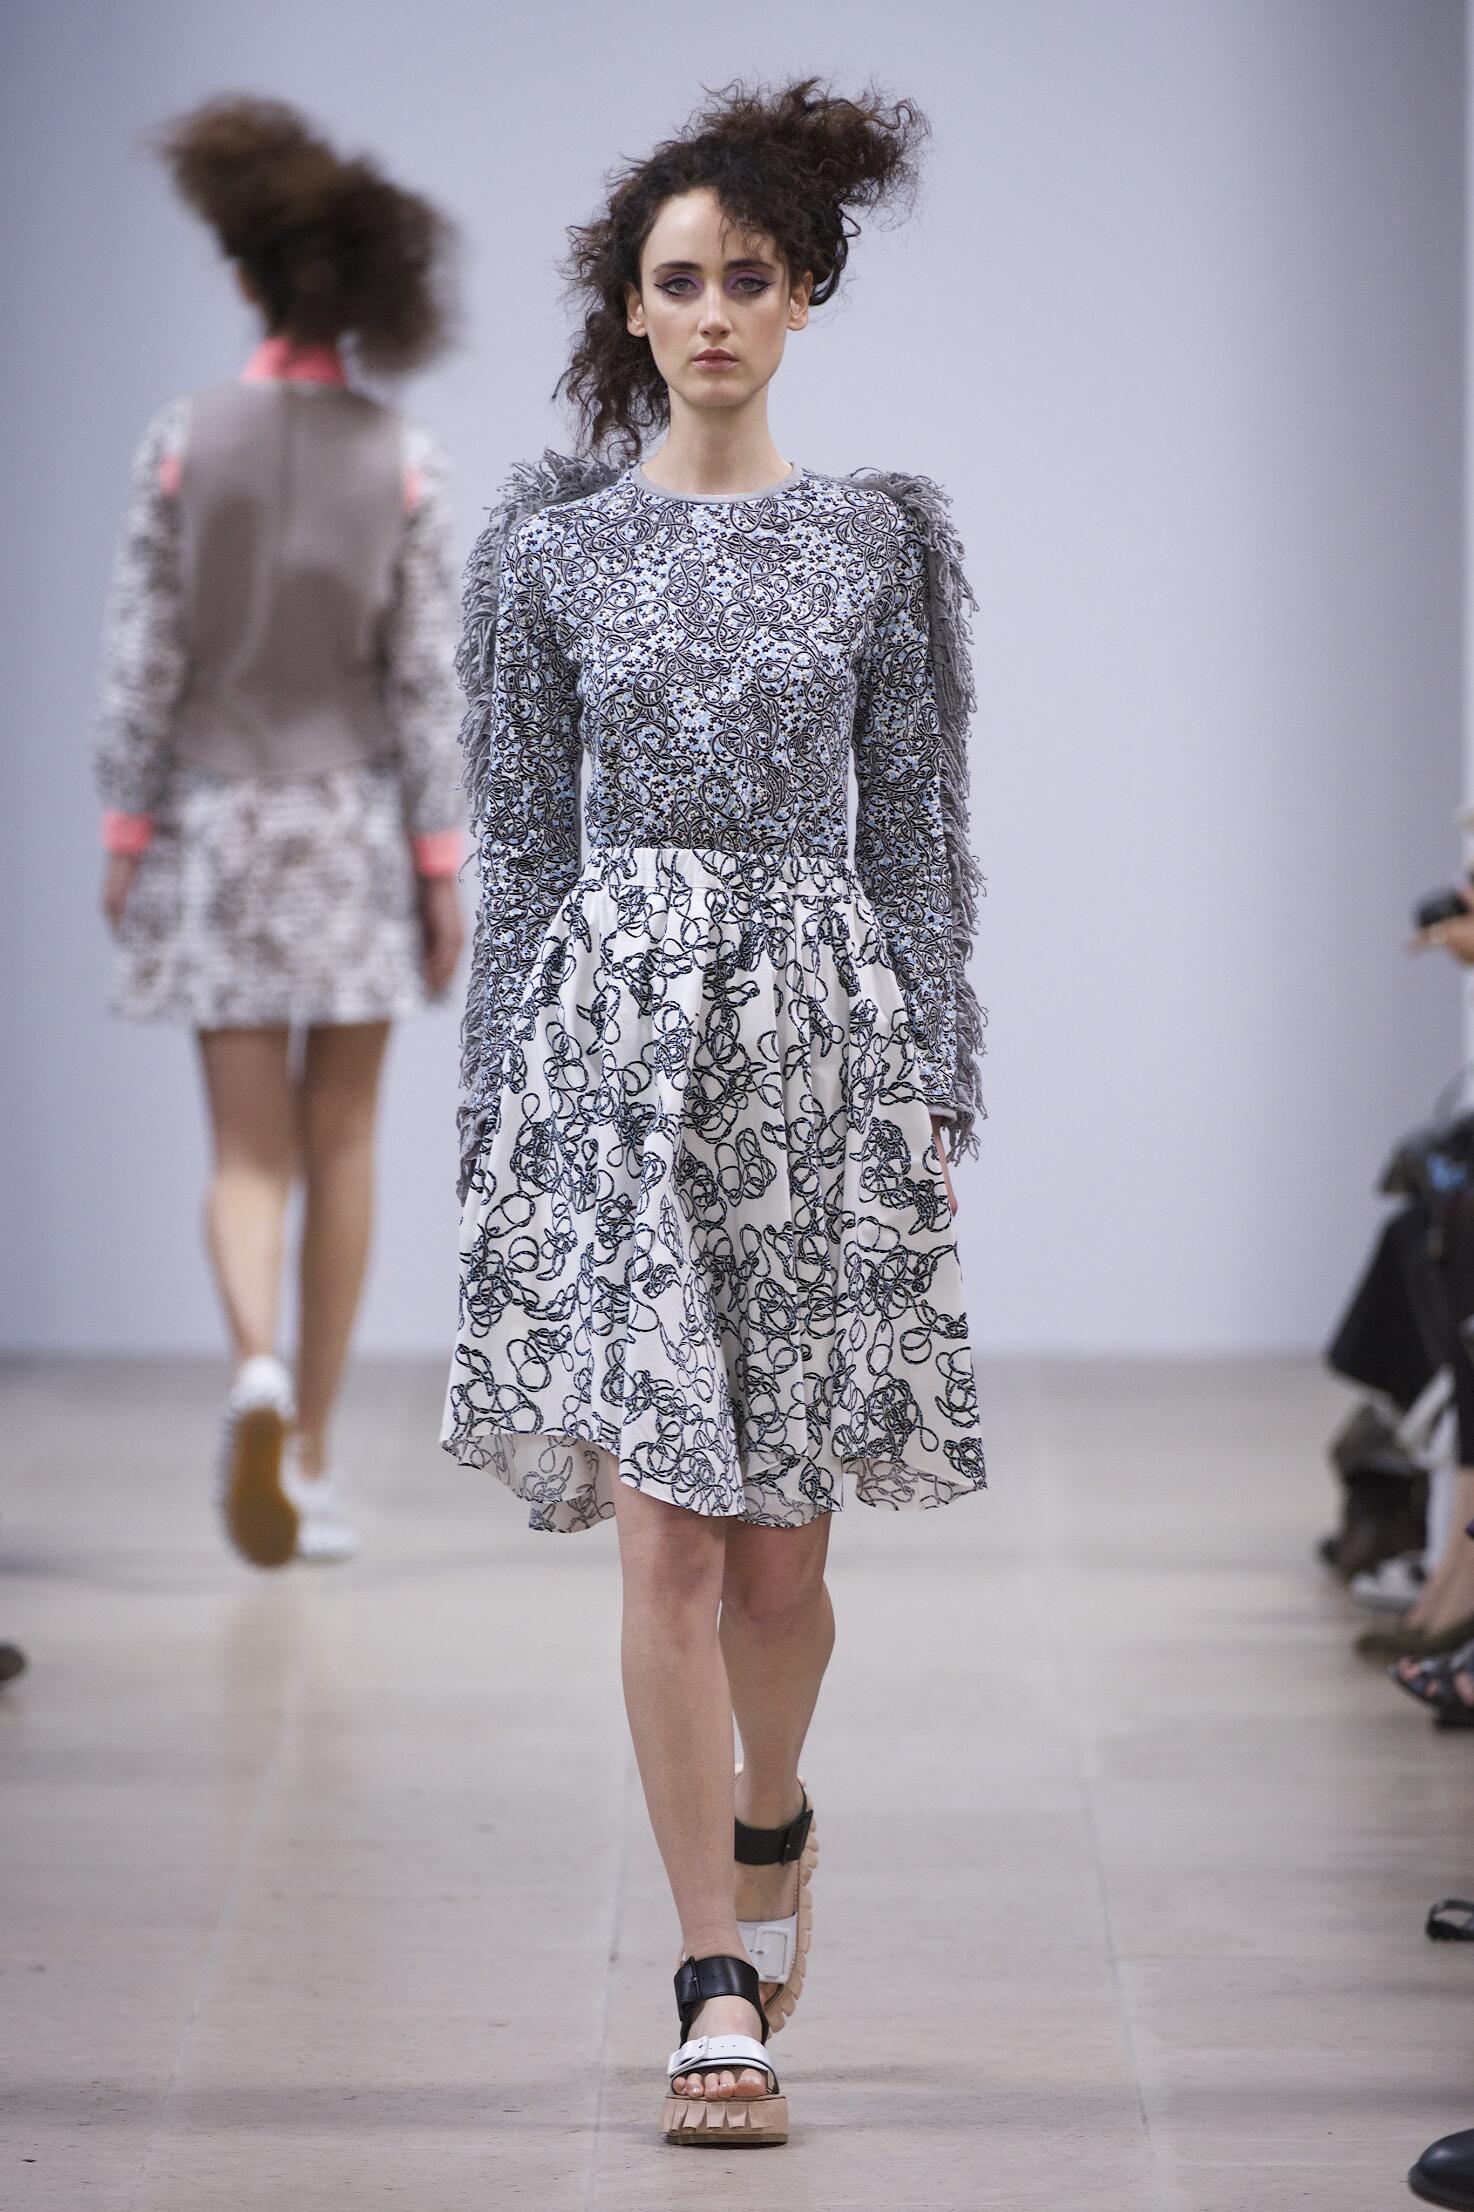 Runway Julien David Spring Summer 2015 Women's Collection Paris Fashion Week